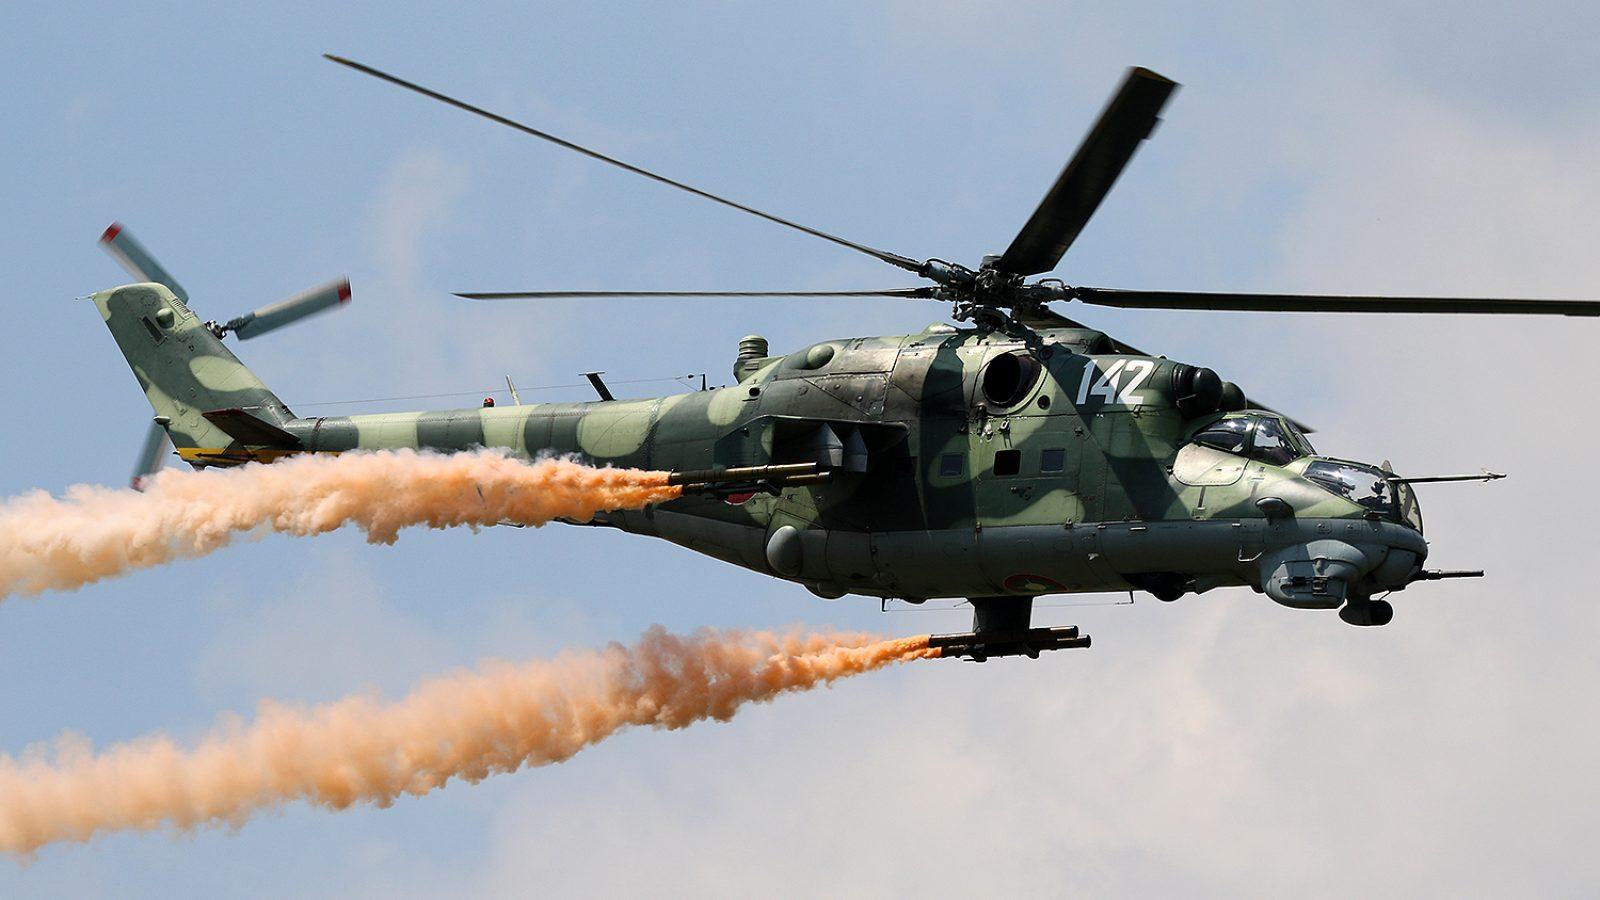 [FOTO REPORTAŽA] Otvoreni dan vazduhoplovne baze Graf Ignjatijevo, jubileji bugarskih Bell 206, MiG-29 i Mi-24